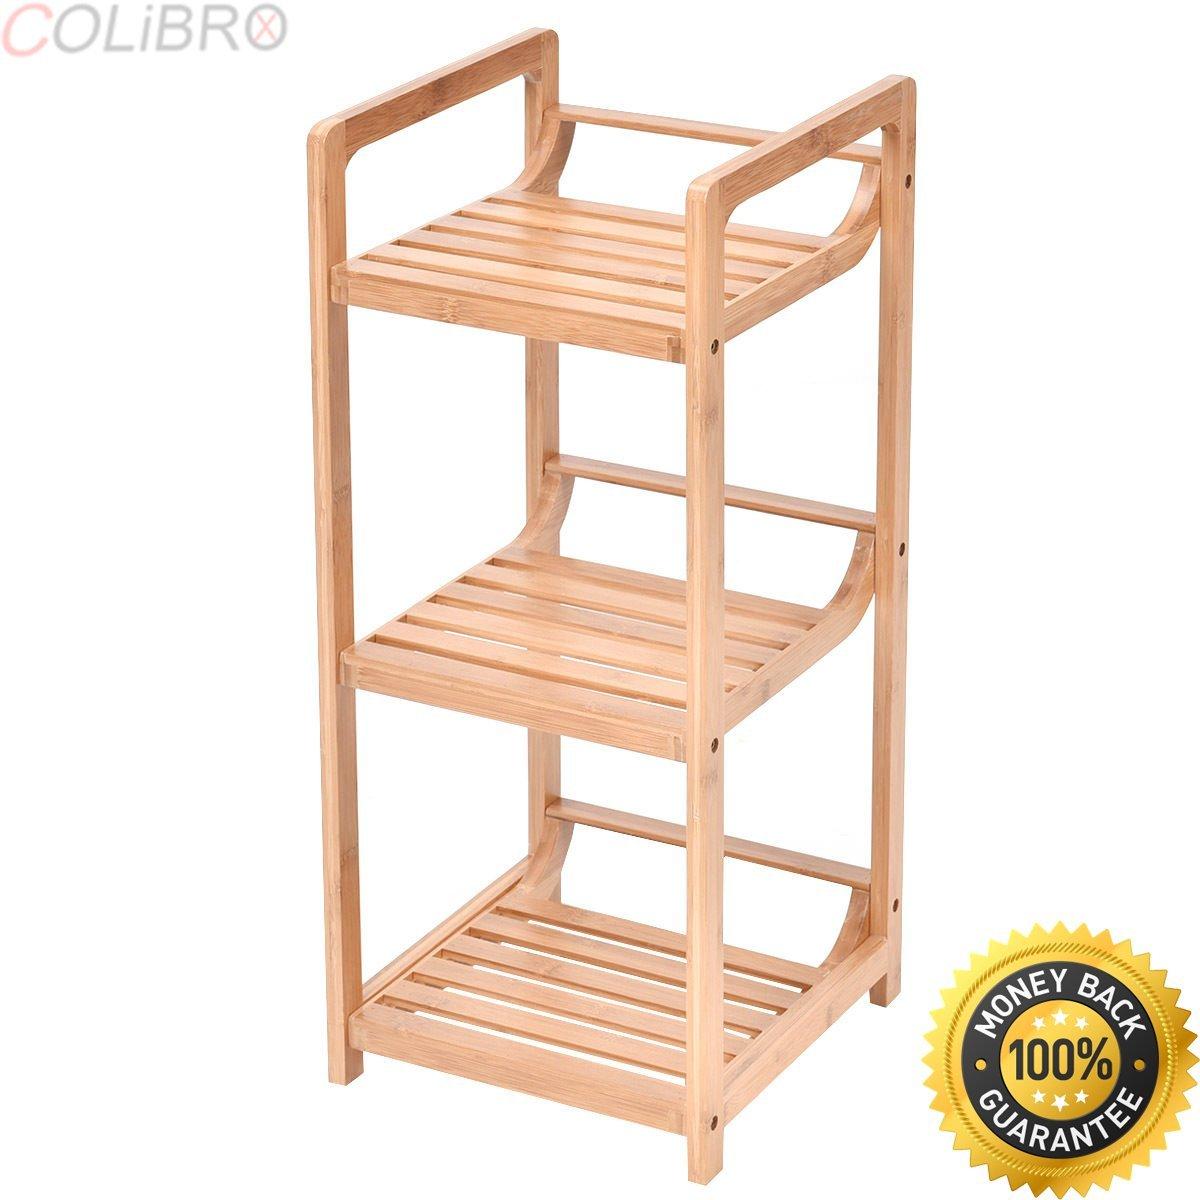 COLIBROX-3-Tier Bathroom Shelf Bamboo Bath Storage Space Saver Organizer Shelves Rack New. bamboo bathroom wall shelf. bamboo bathroom space saver over toilet. bamboo space saver bed bath beyond.